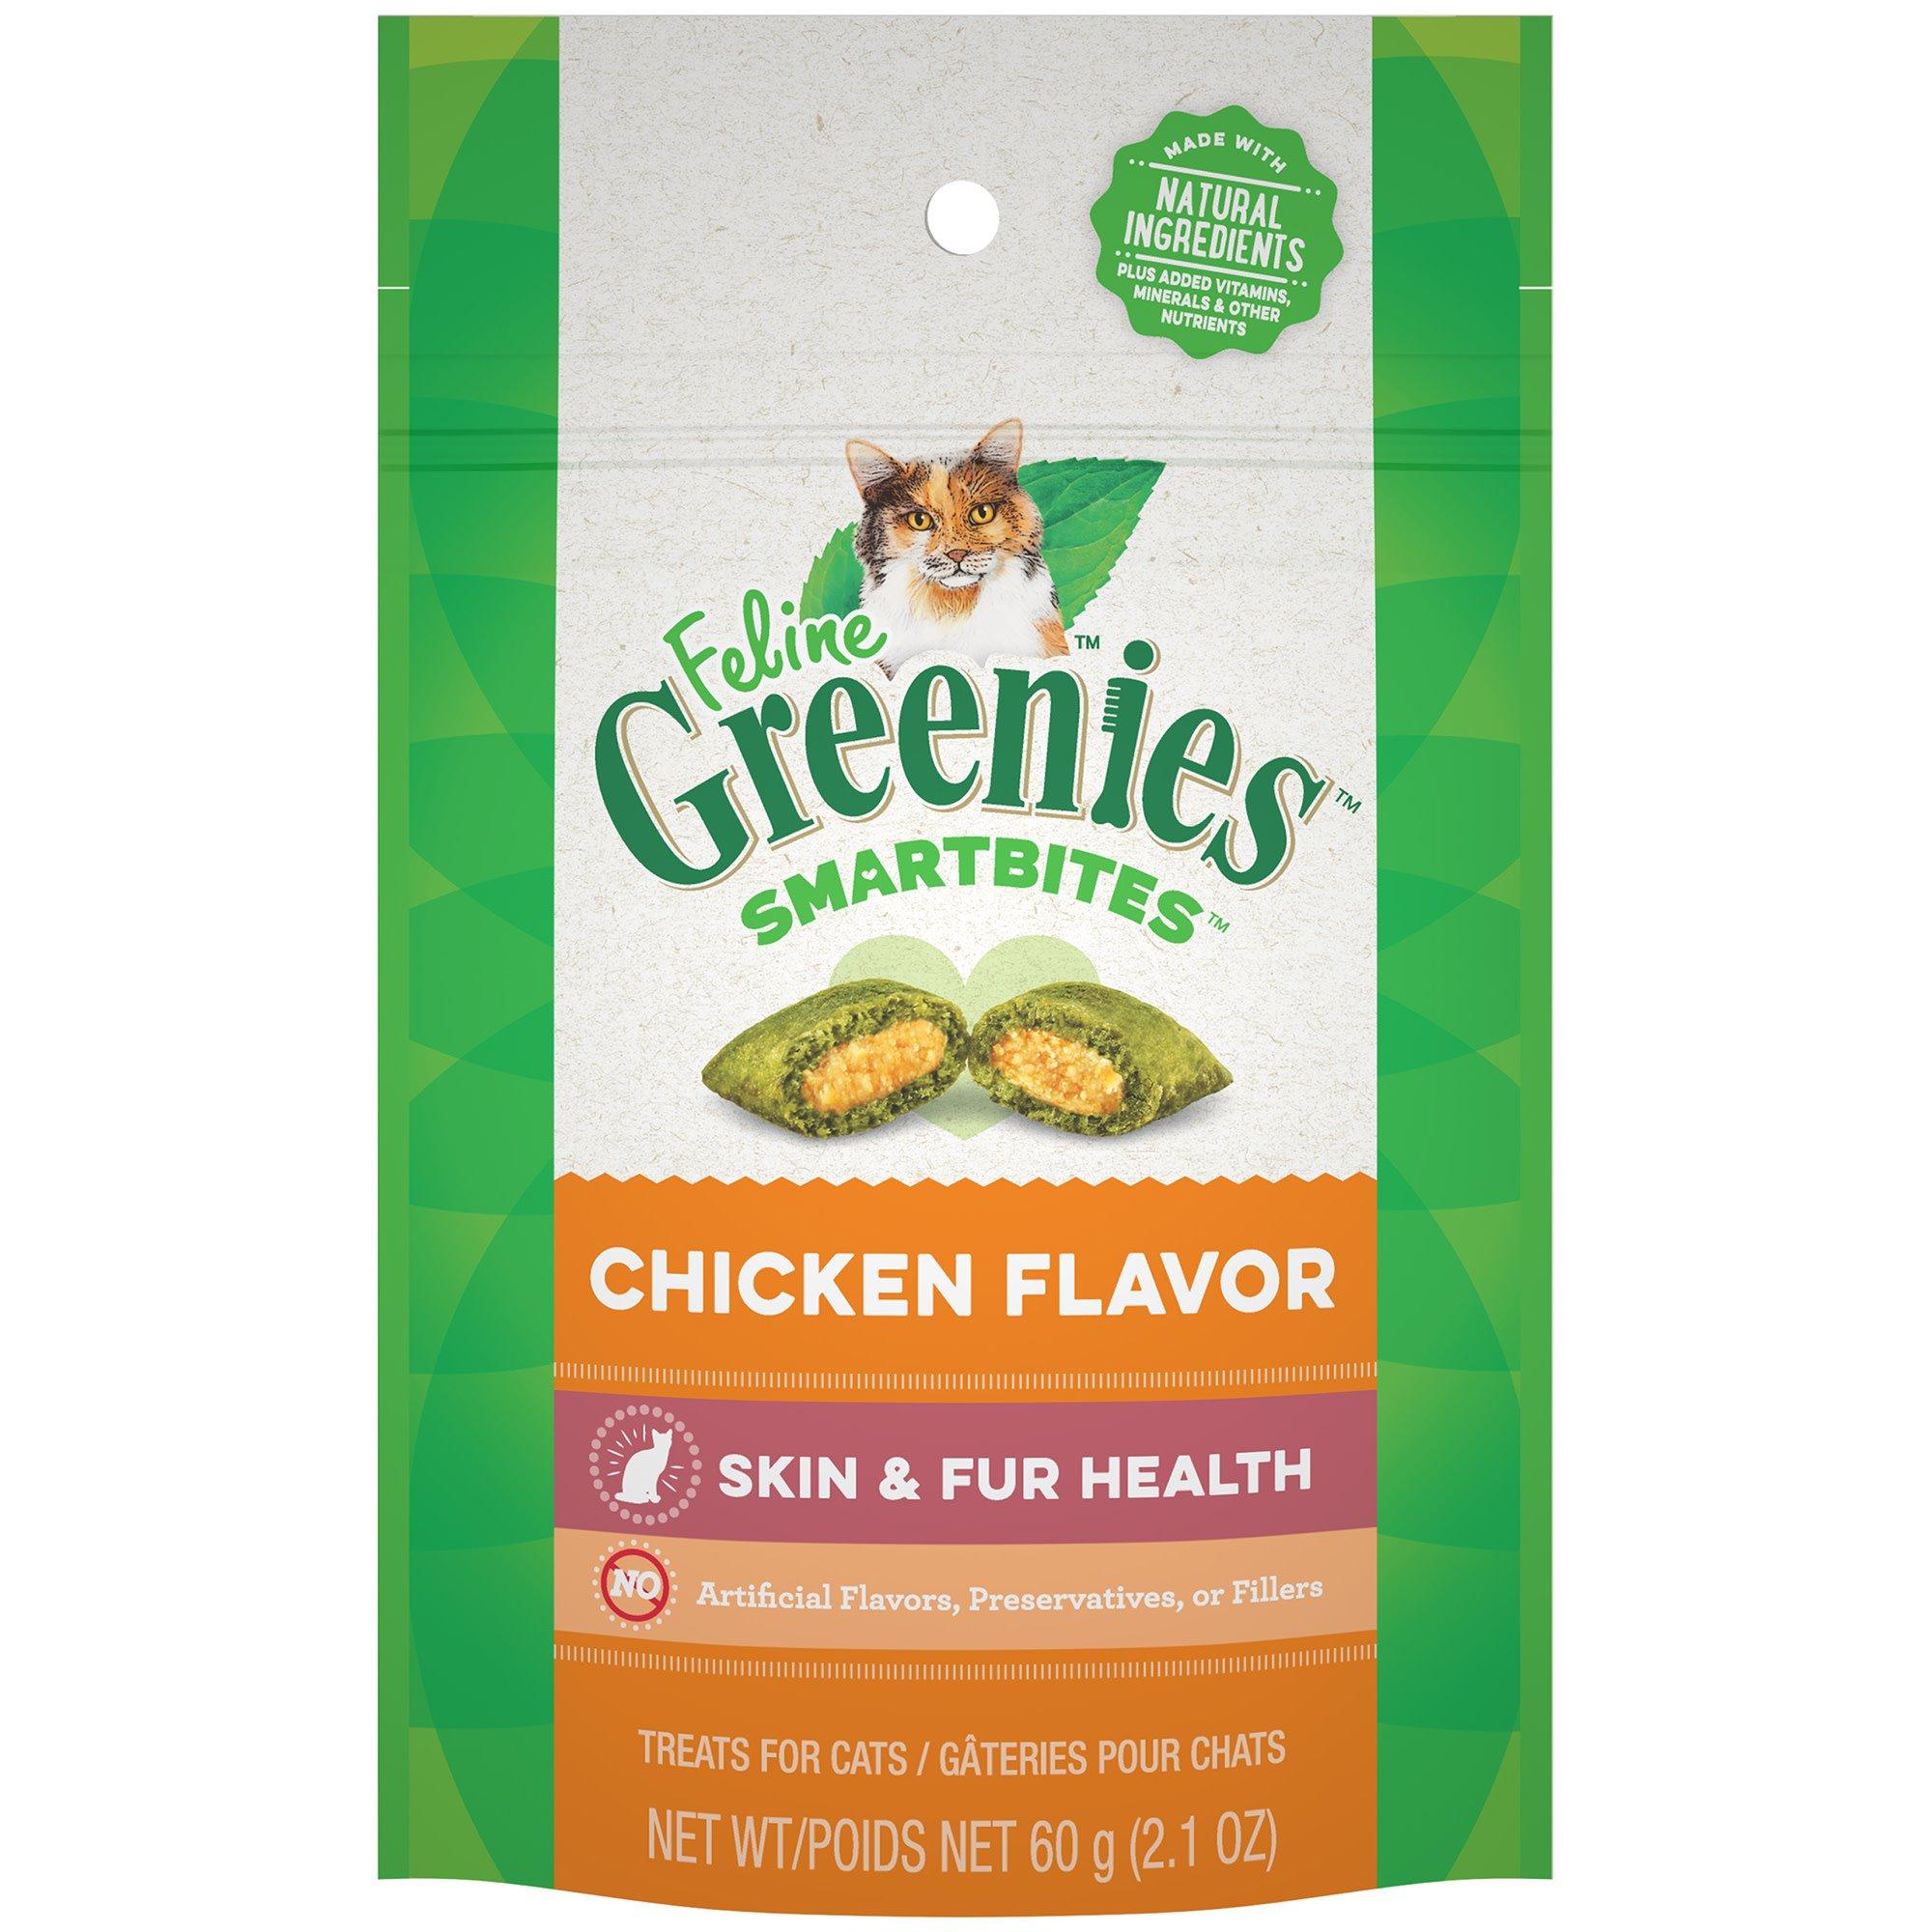 Feline Greenies Smartbites Healthy Skin and Fur Chicken Flavor